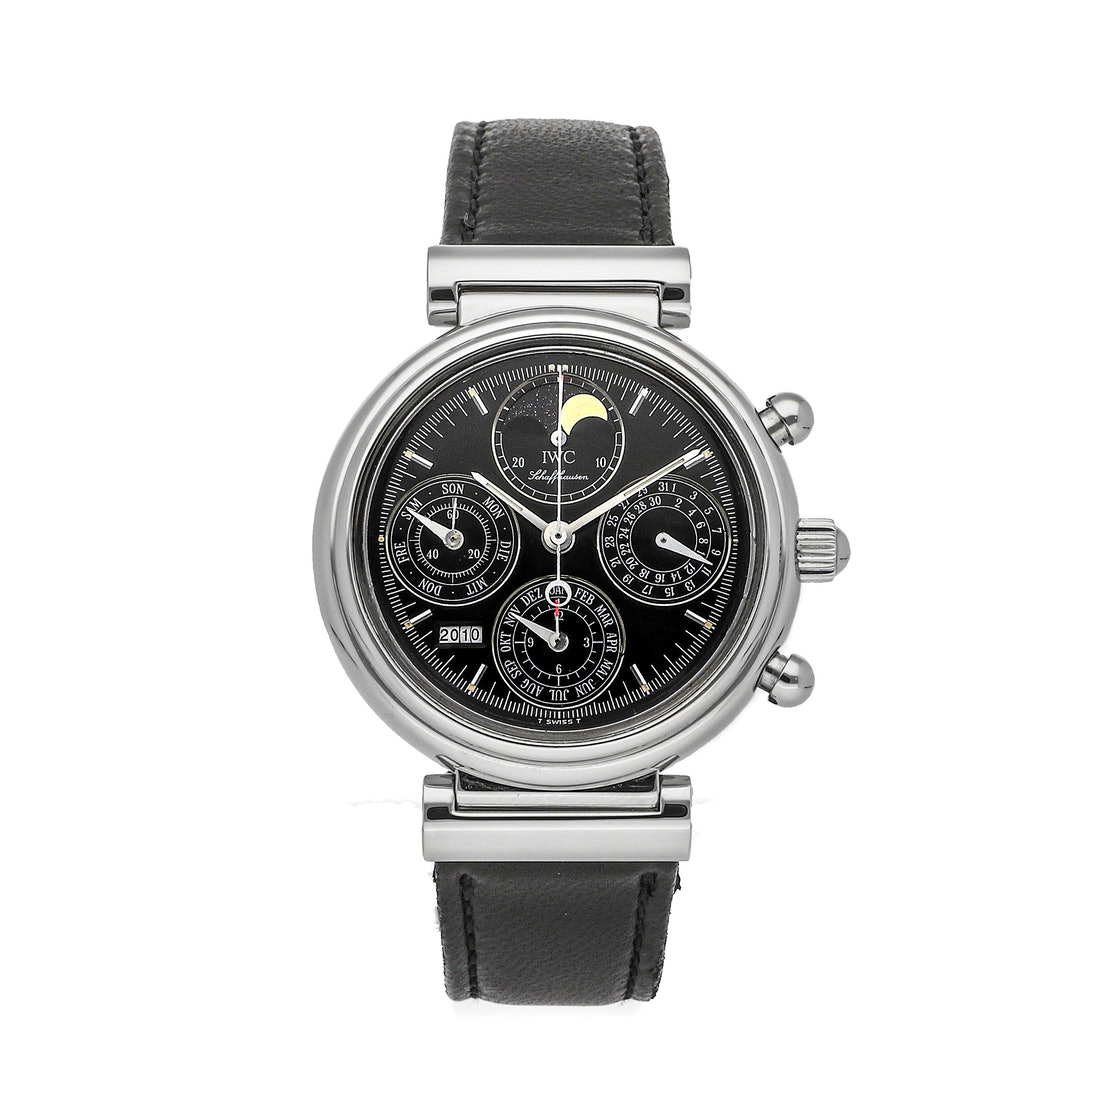 IWC Da Vinci Perpetual Calendar Chronograph 3750-28